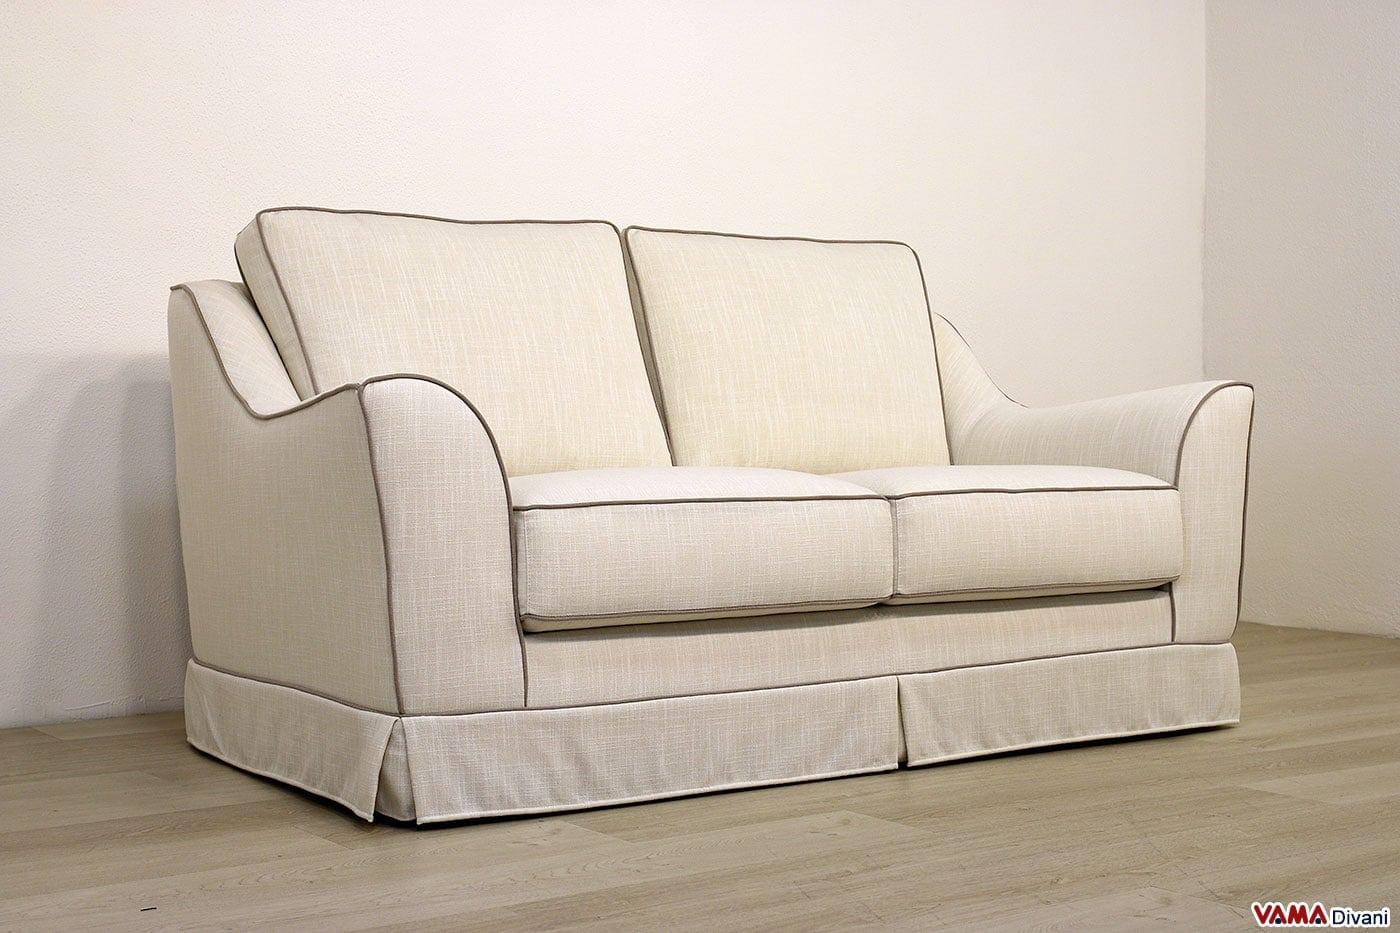 Divano classico marte vama divani - Misure divano 2 posti ...